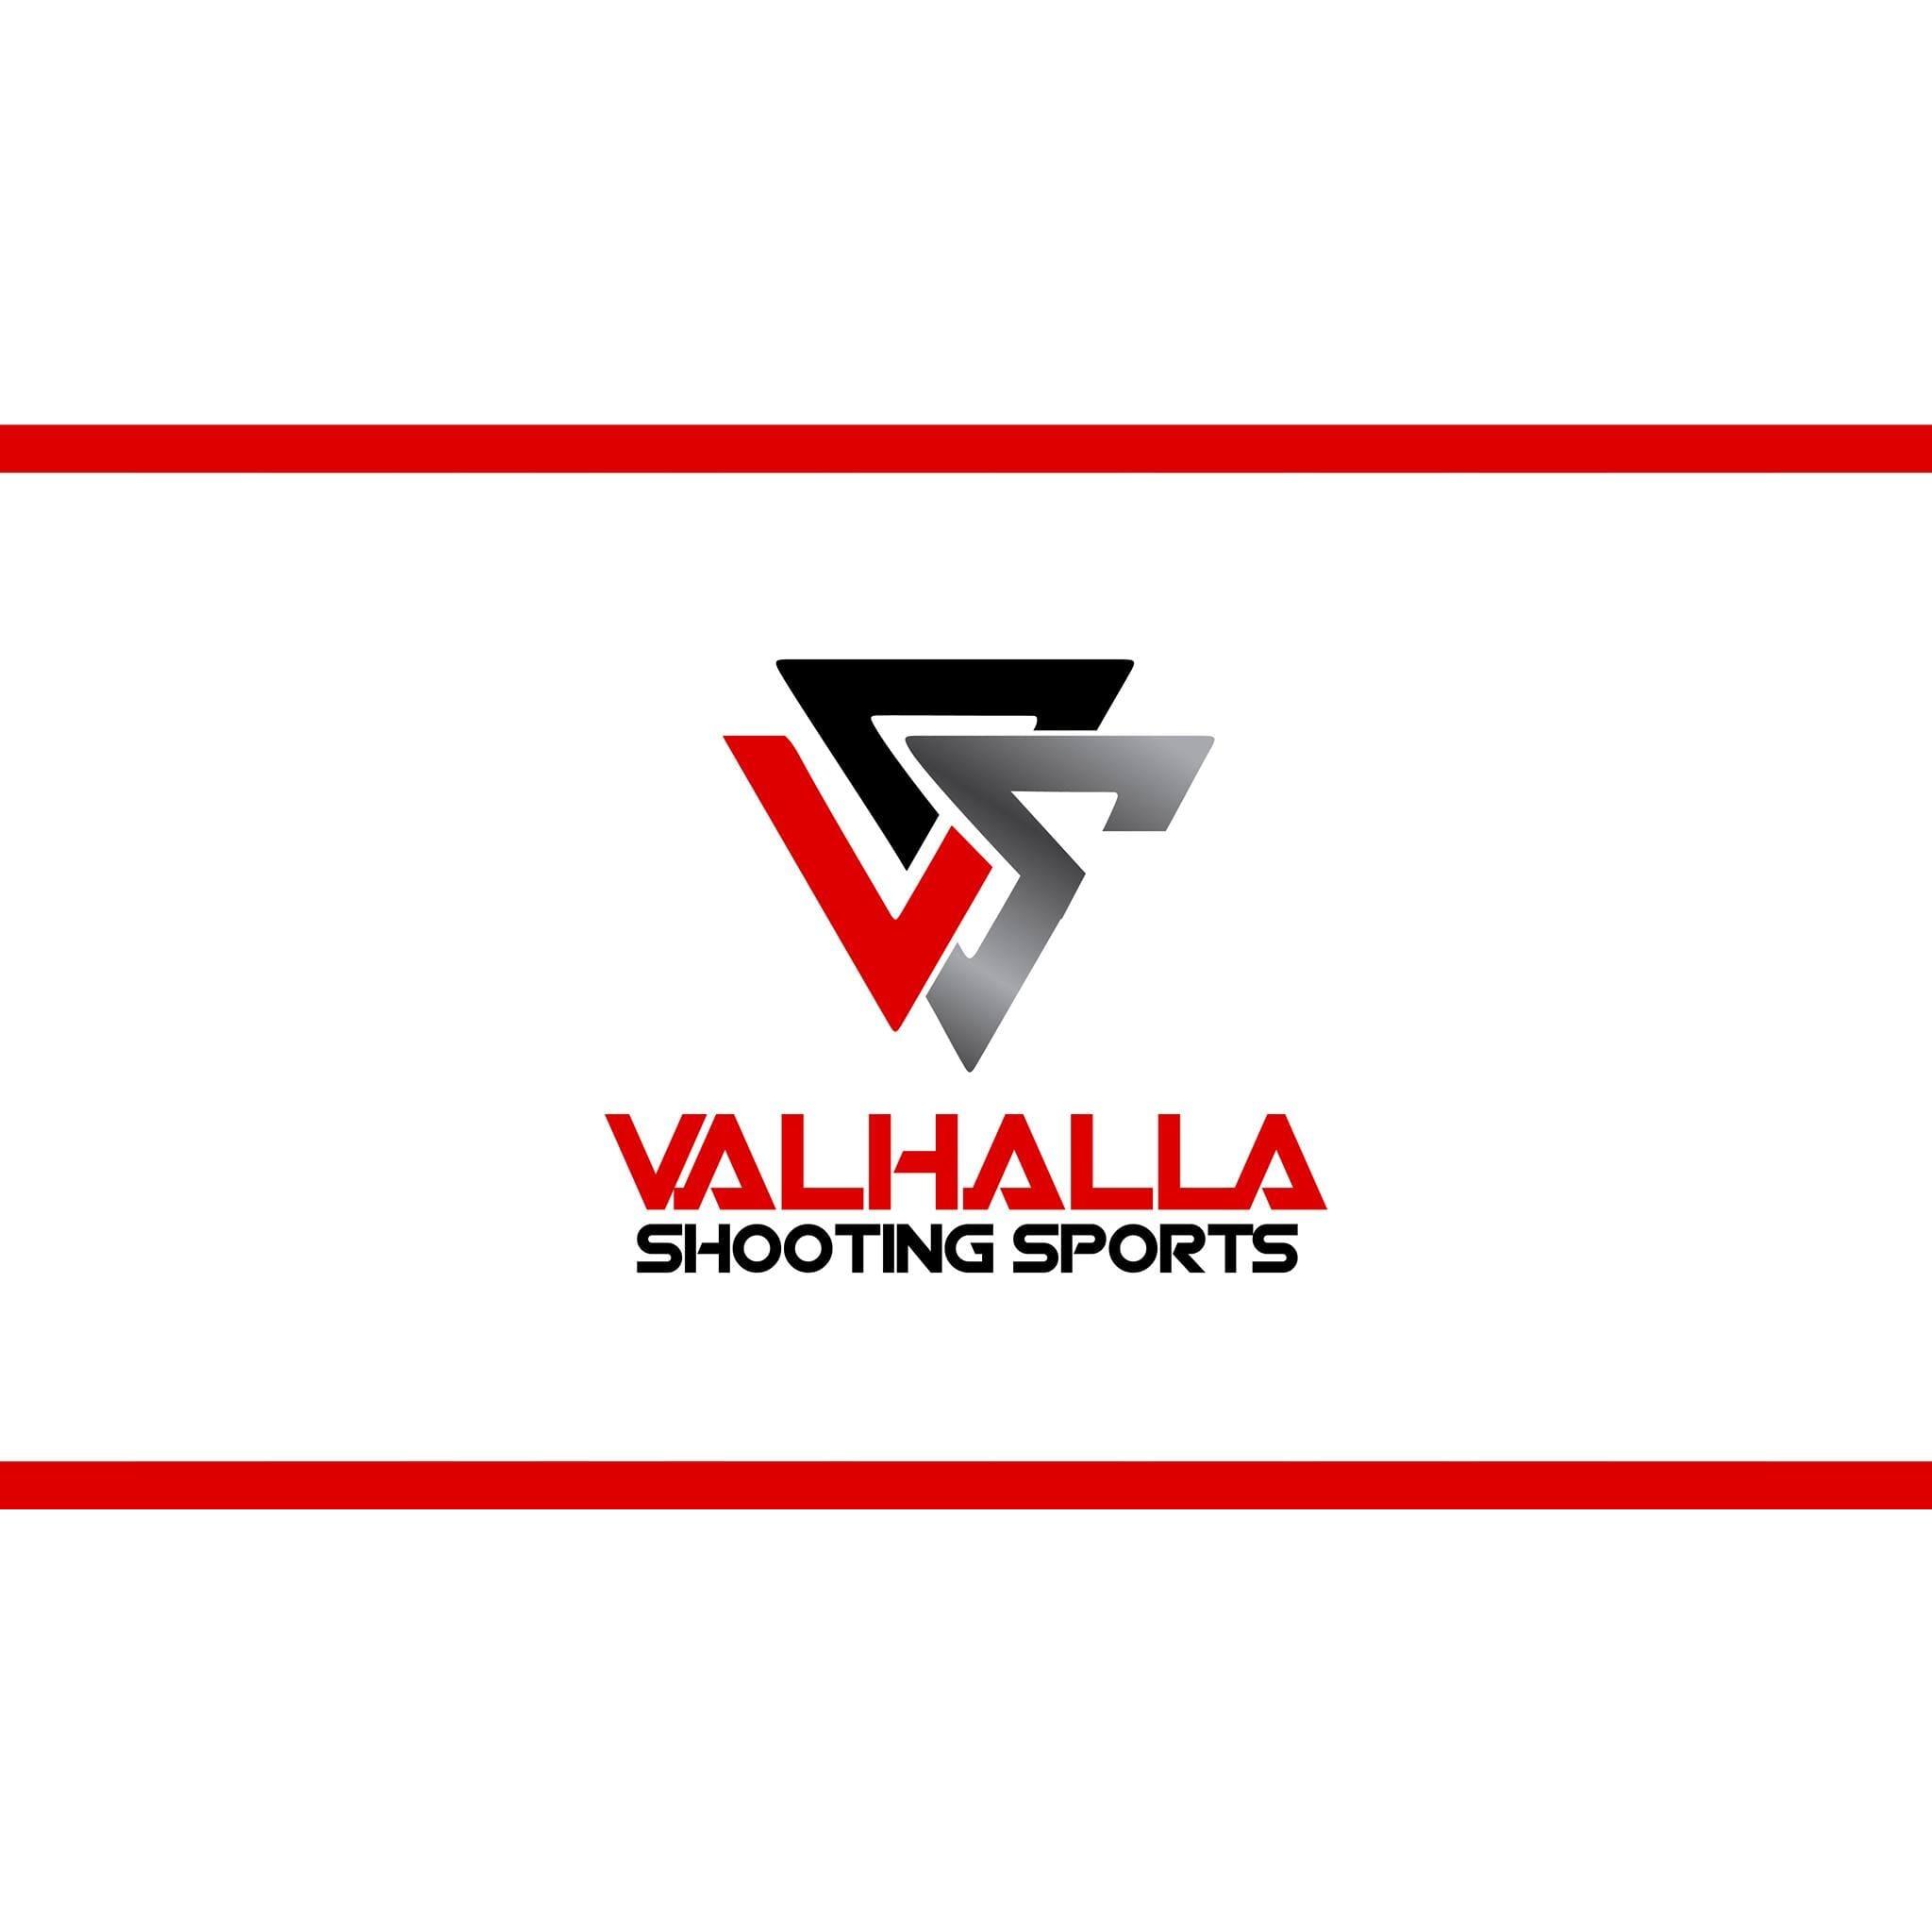 Valhalla Shooting Sports